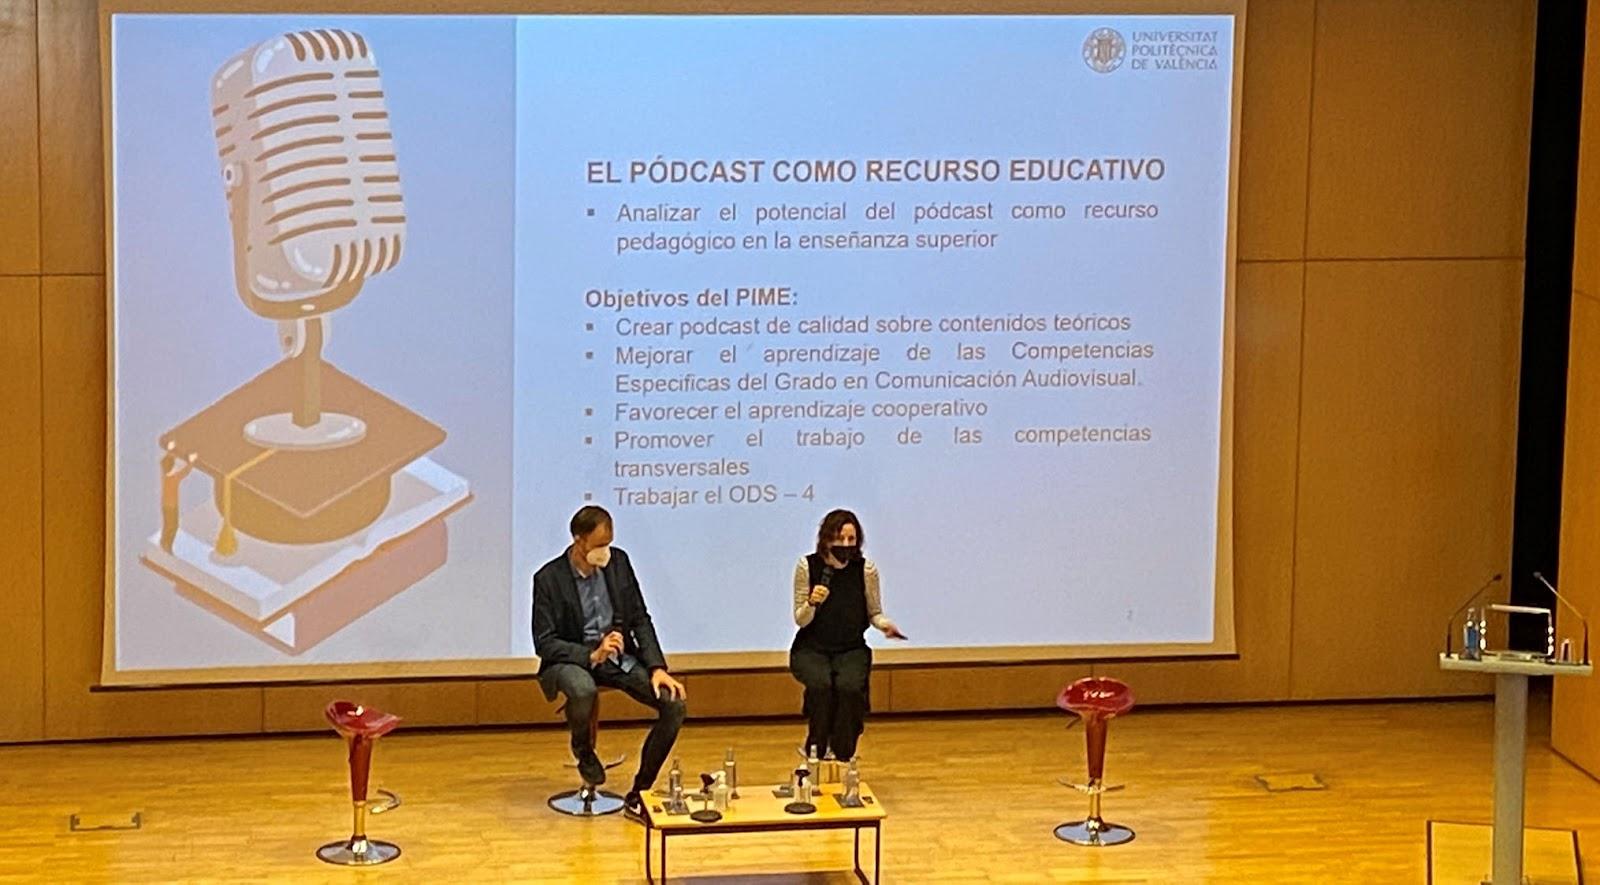 EDUCAST'21, JORNADA DEL PODCAST EDUCATIVO